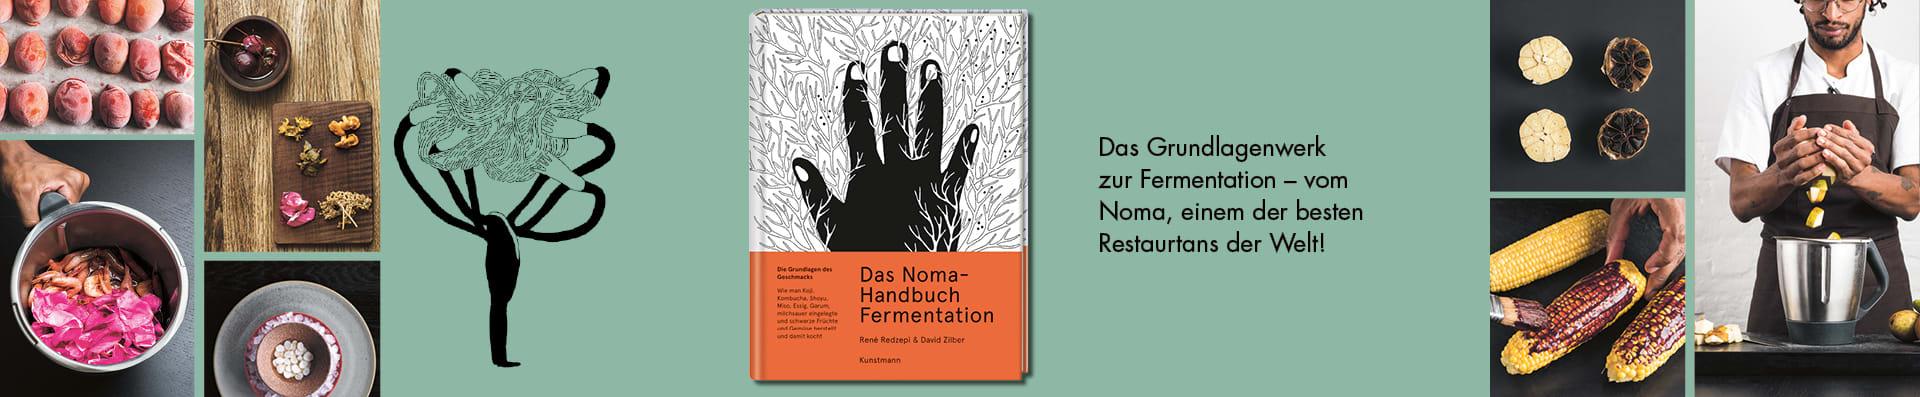 Redzepi, Zilber – das Noma Handbuch Fermentation